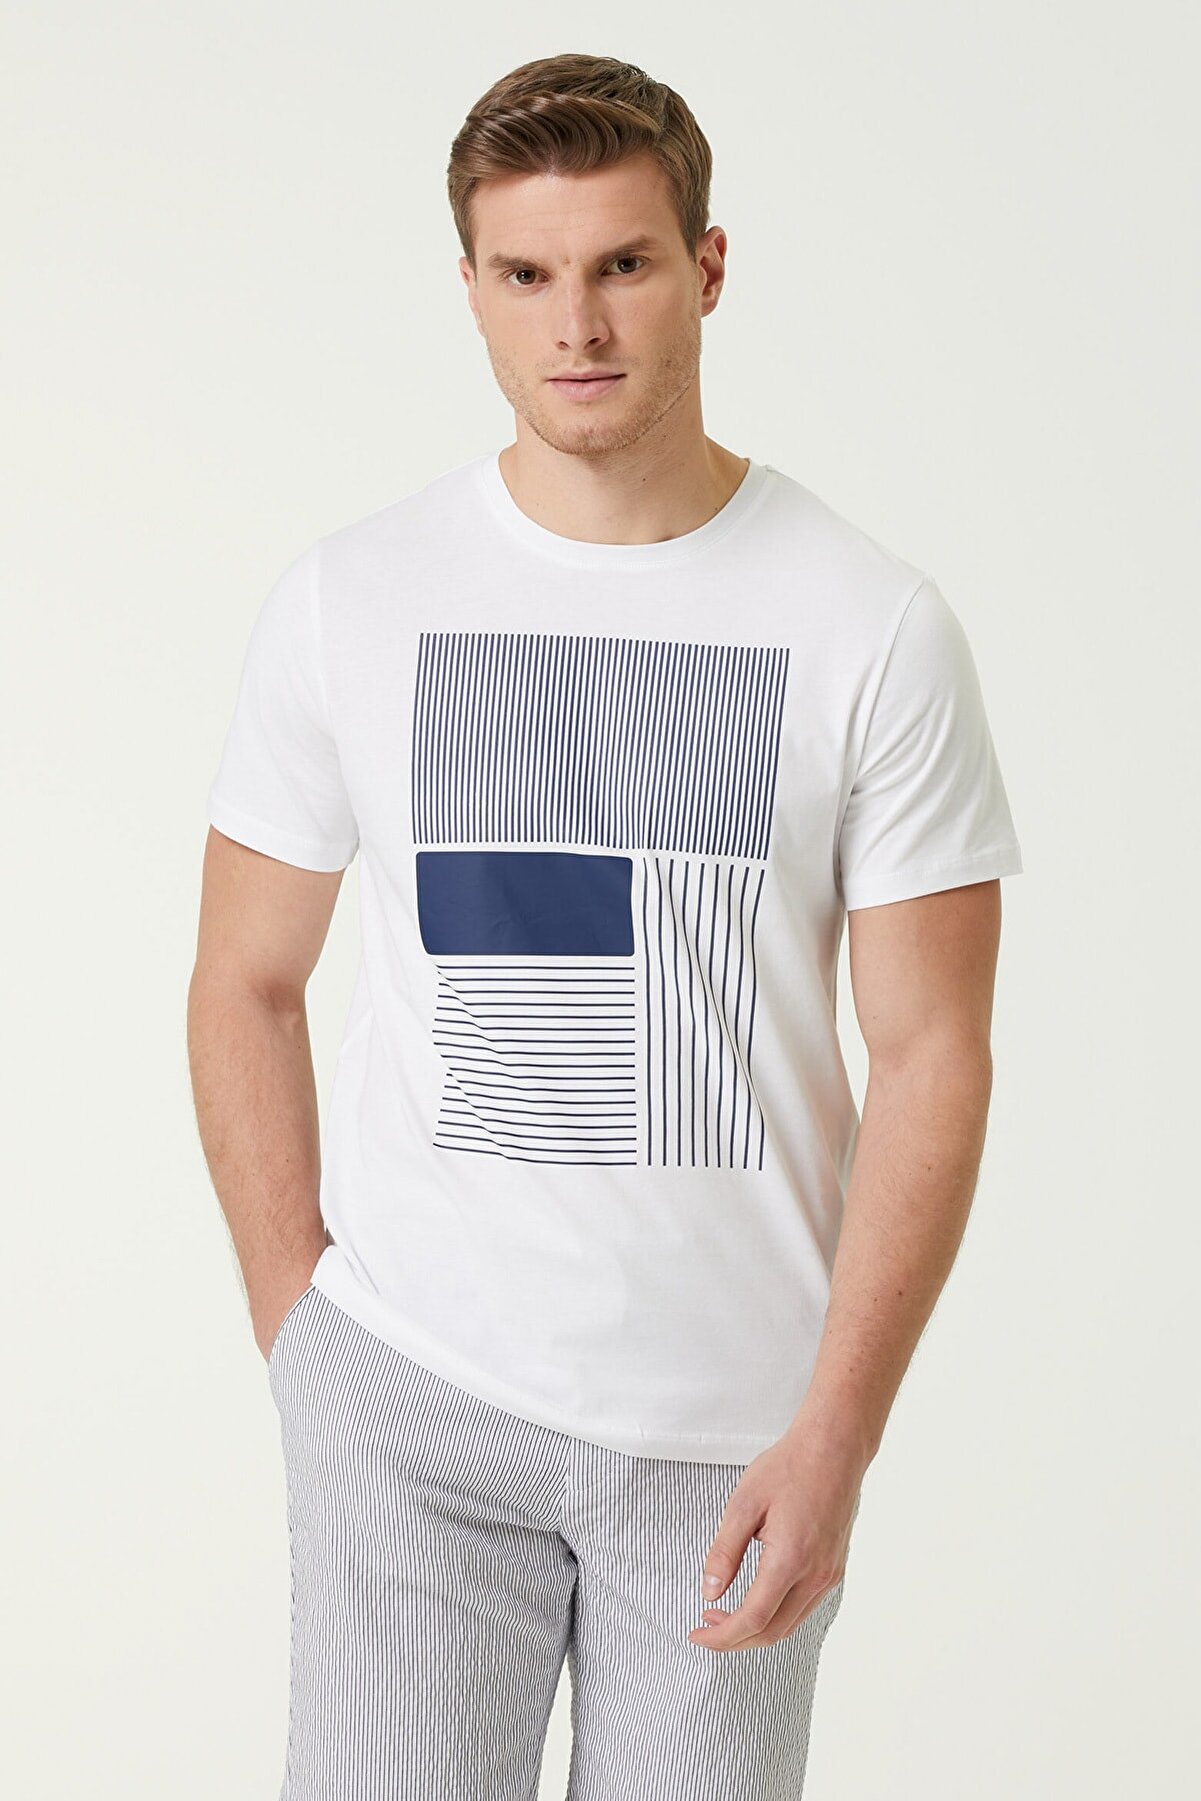 Network Erkek Slim Fit Beyaz Şerit Baskılı T-shirt 1078296